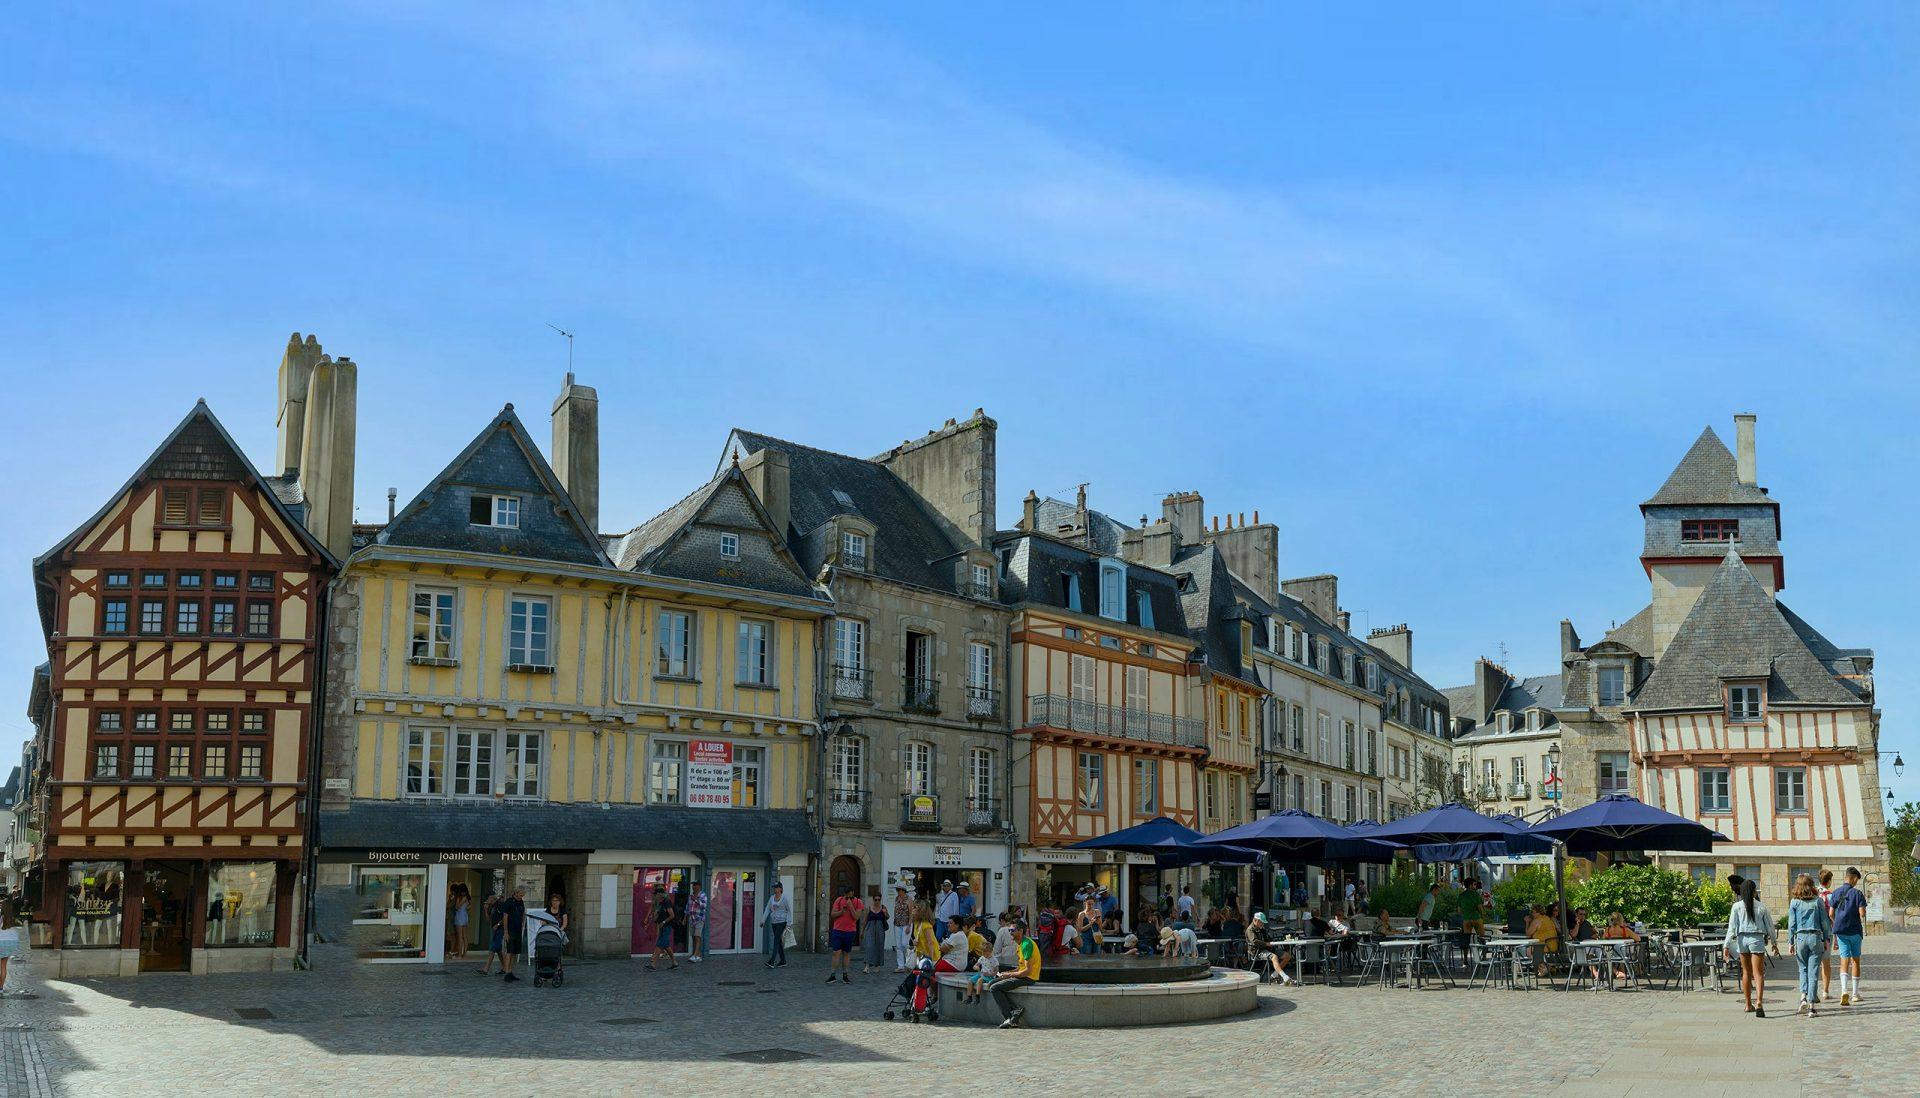 Quimper, Finistere : France Quimper, Finistere : France